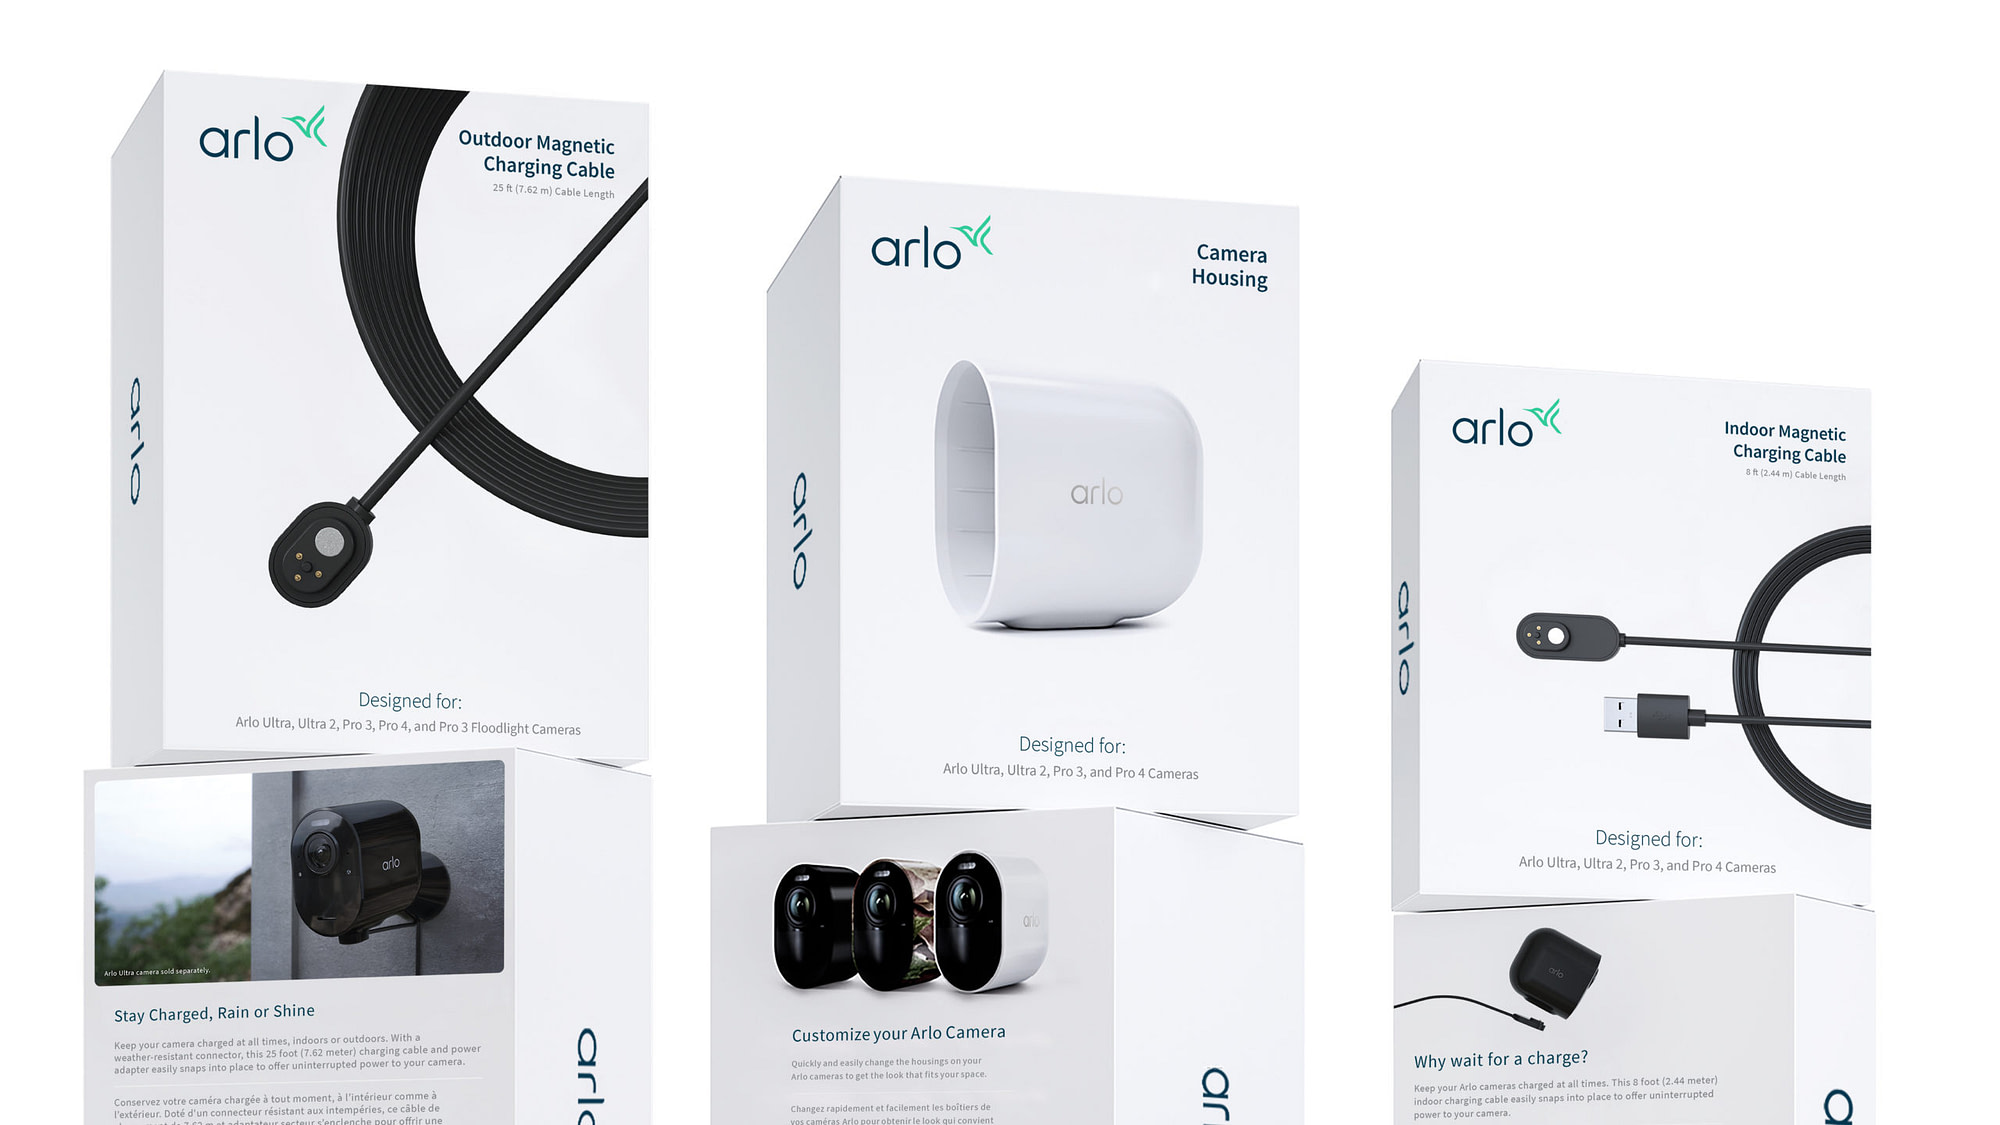 3D design showcasing new Arlo accessory packaging design and Arlo rebrand.